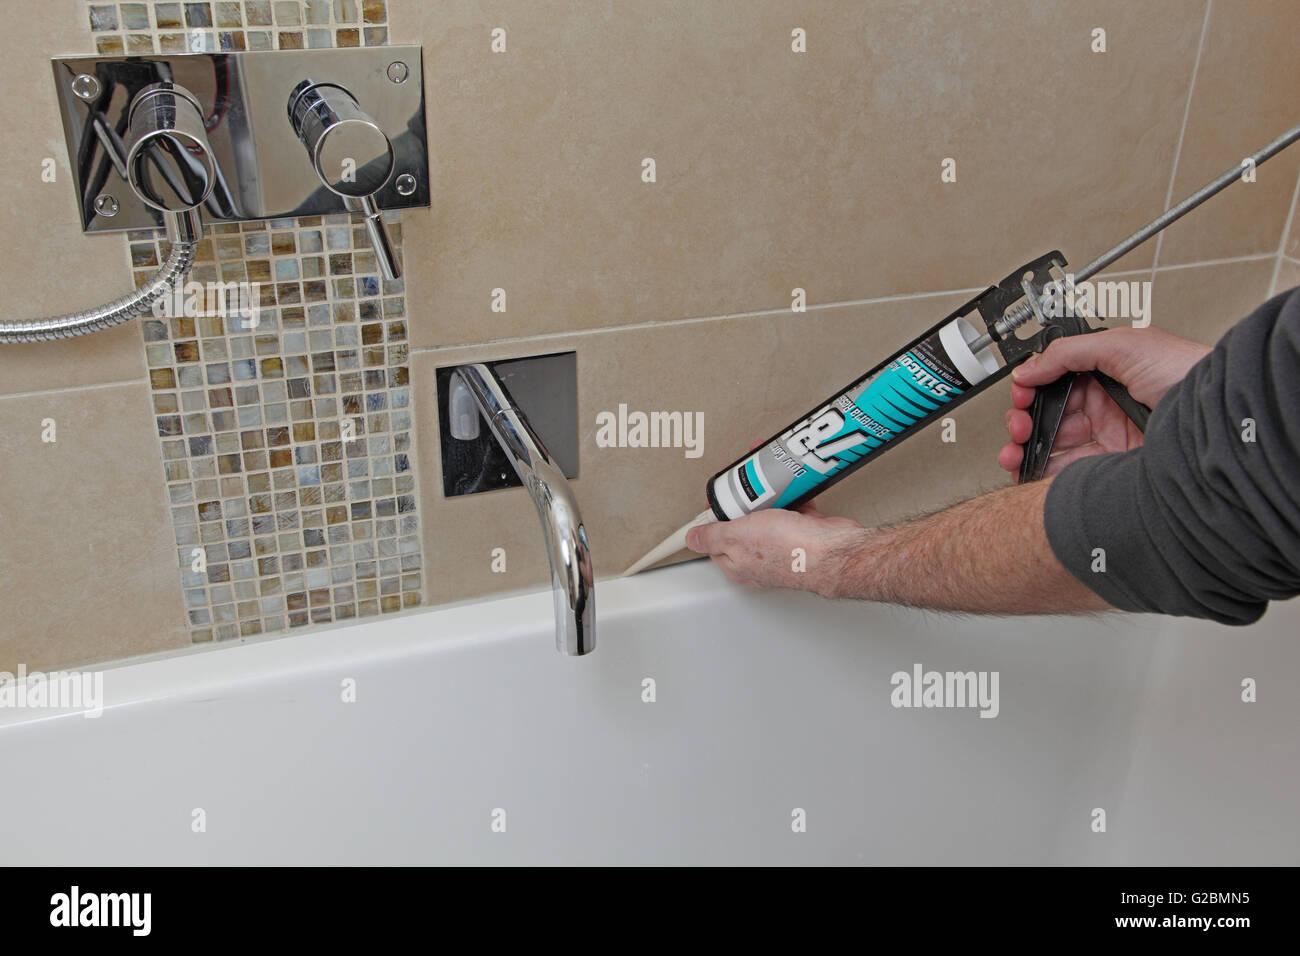 Bathroom Tiles Stock Photos & Bathroom Tiles Stock Images - Alamy